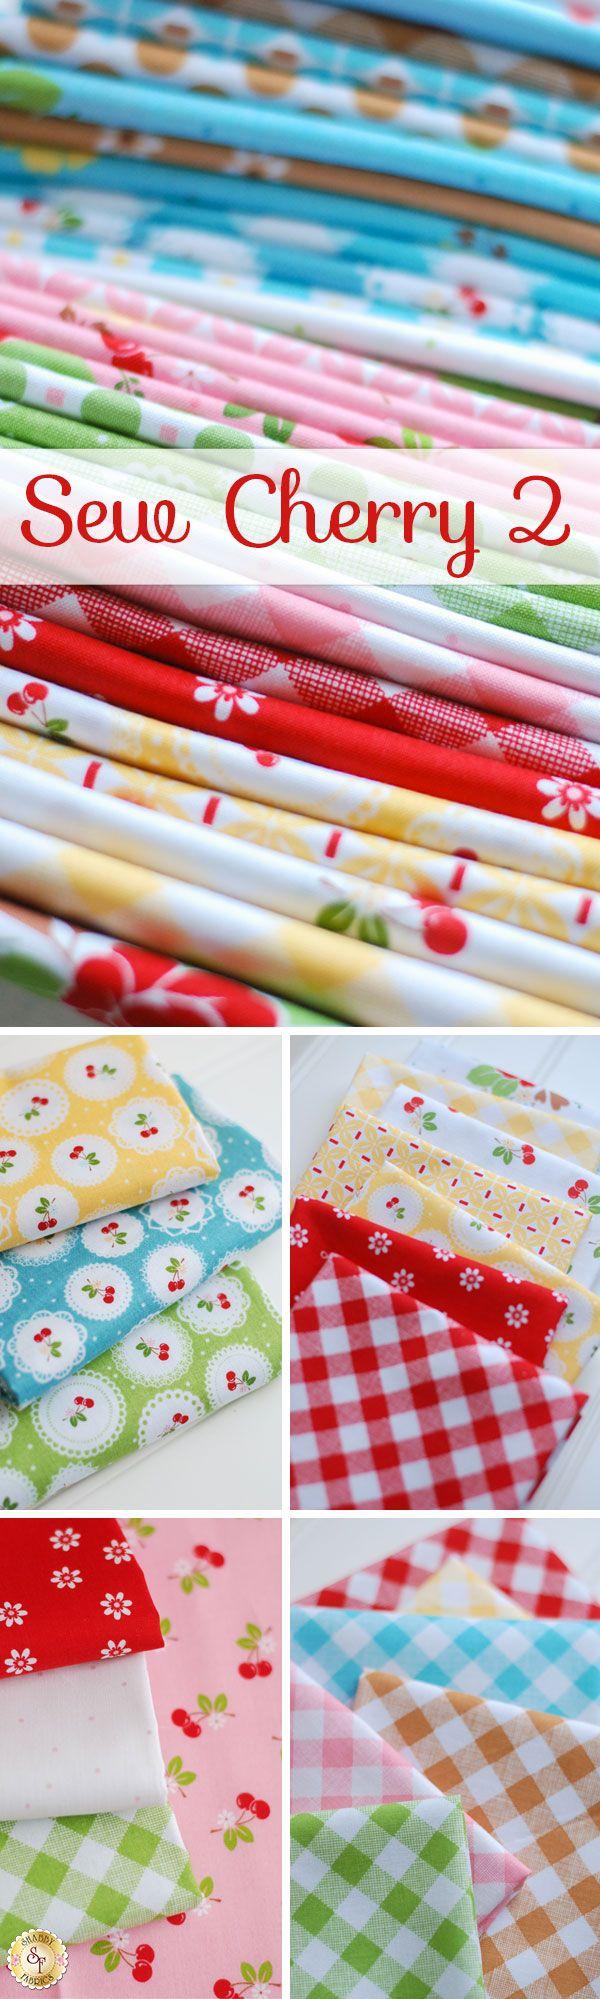 quilting photo patchwork blue quilt art design en collage textile images material free linens modern pattern